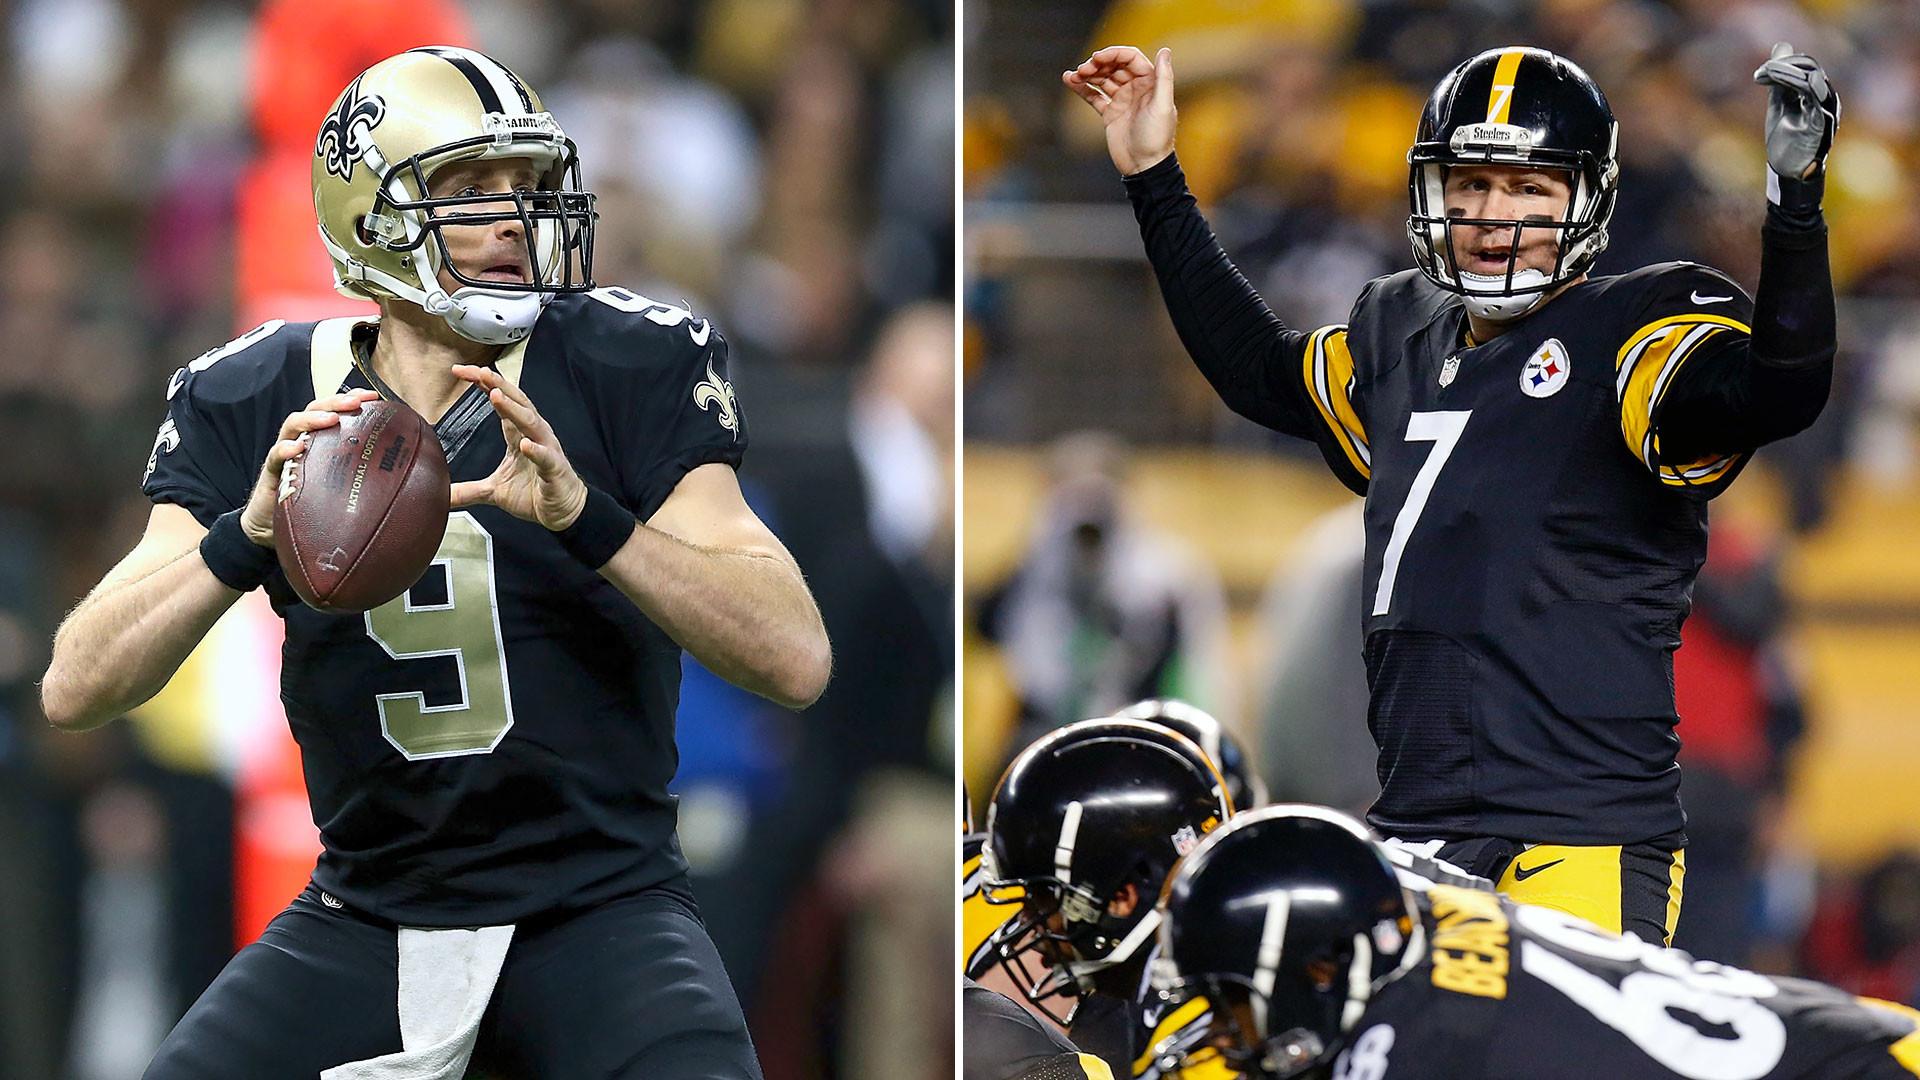 Fantasy Football Draft Decision: Drew Brees or Ben Roethlisberger? |  Fantasy | Sporting News